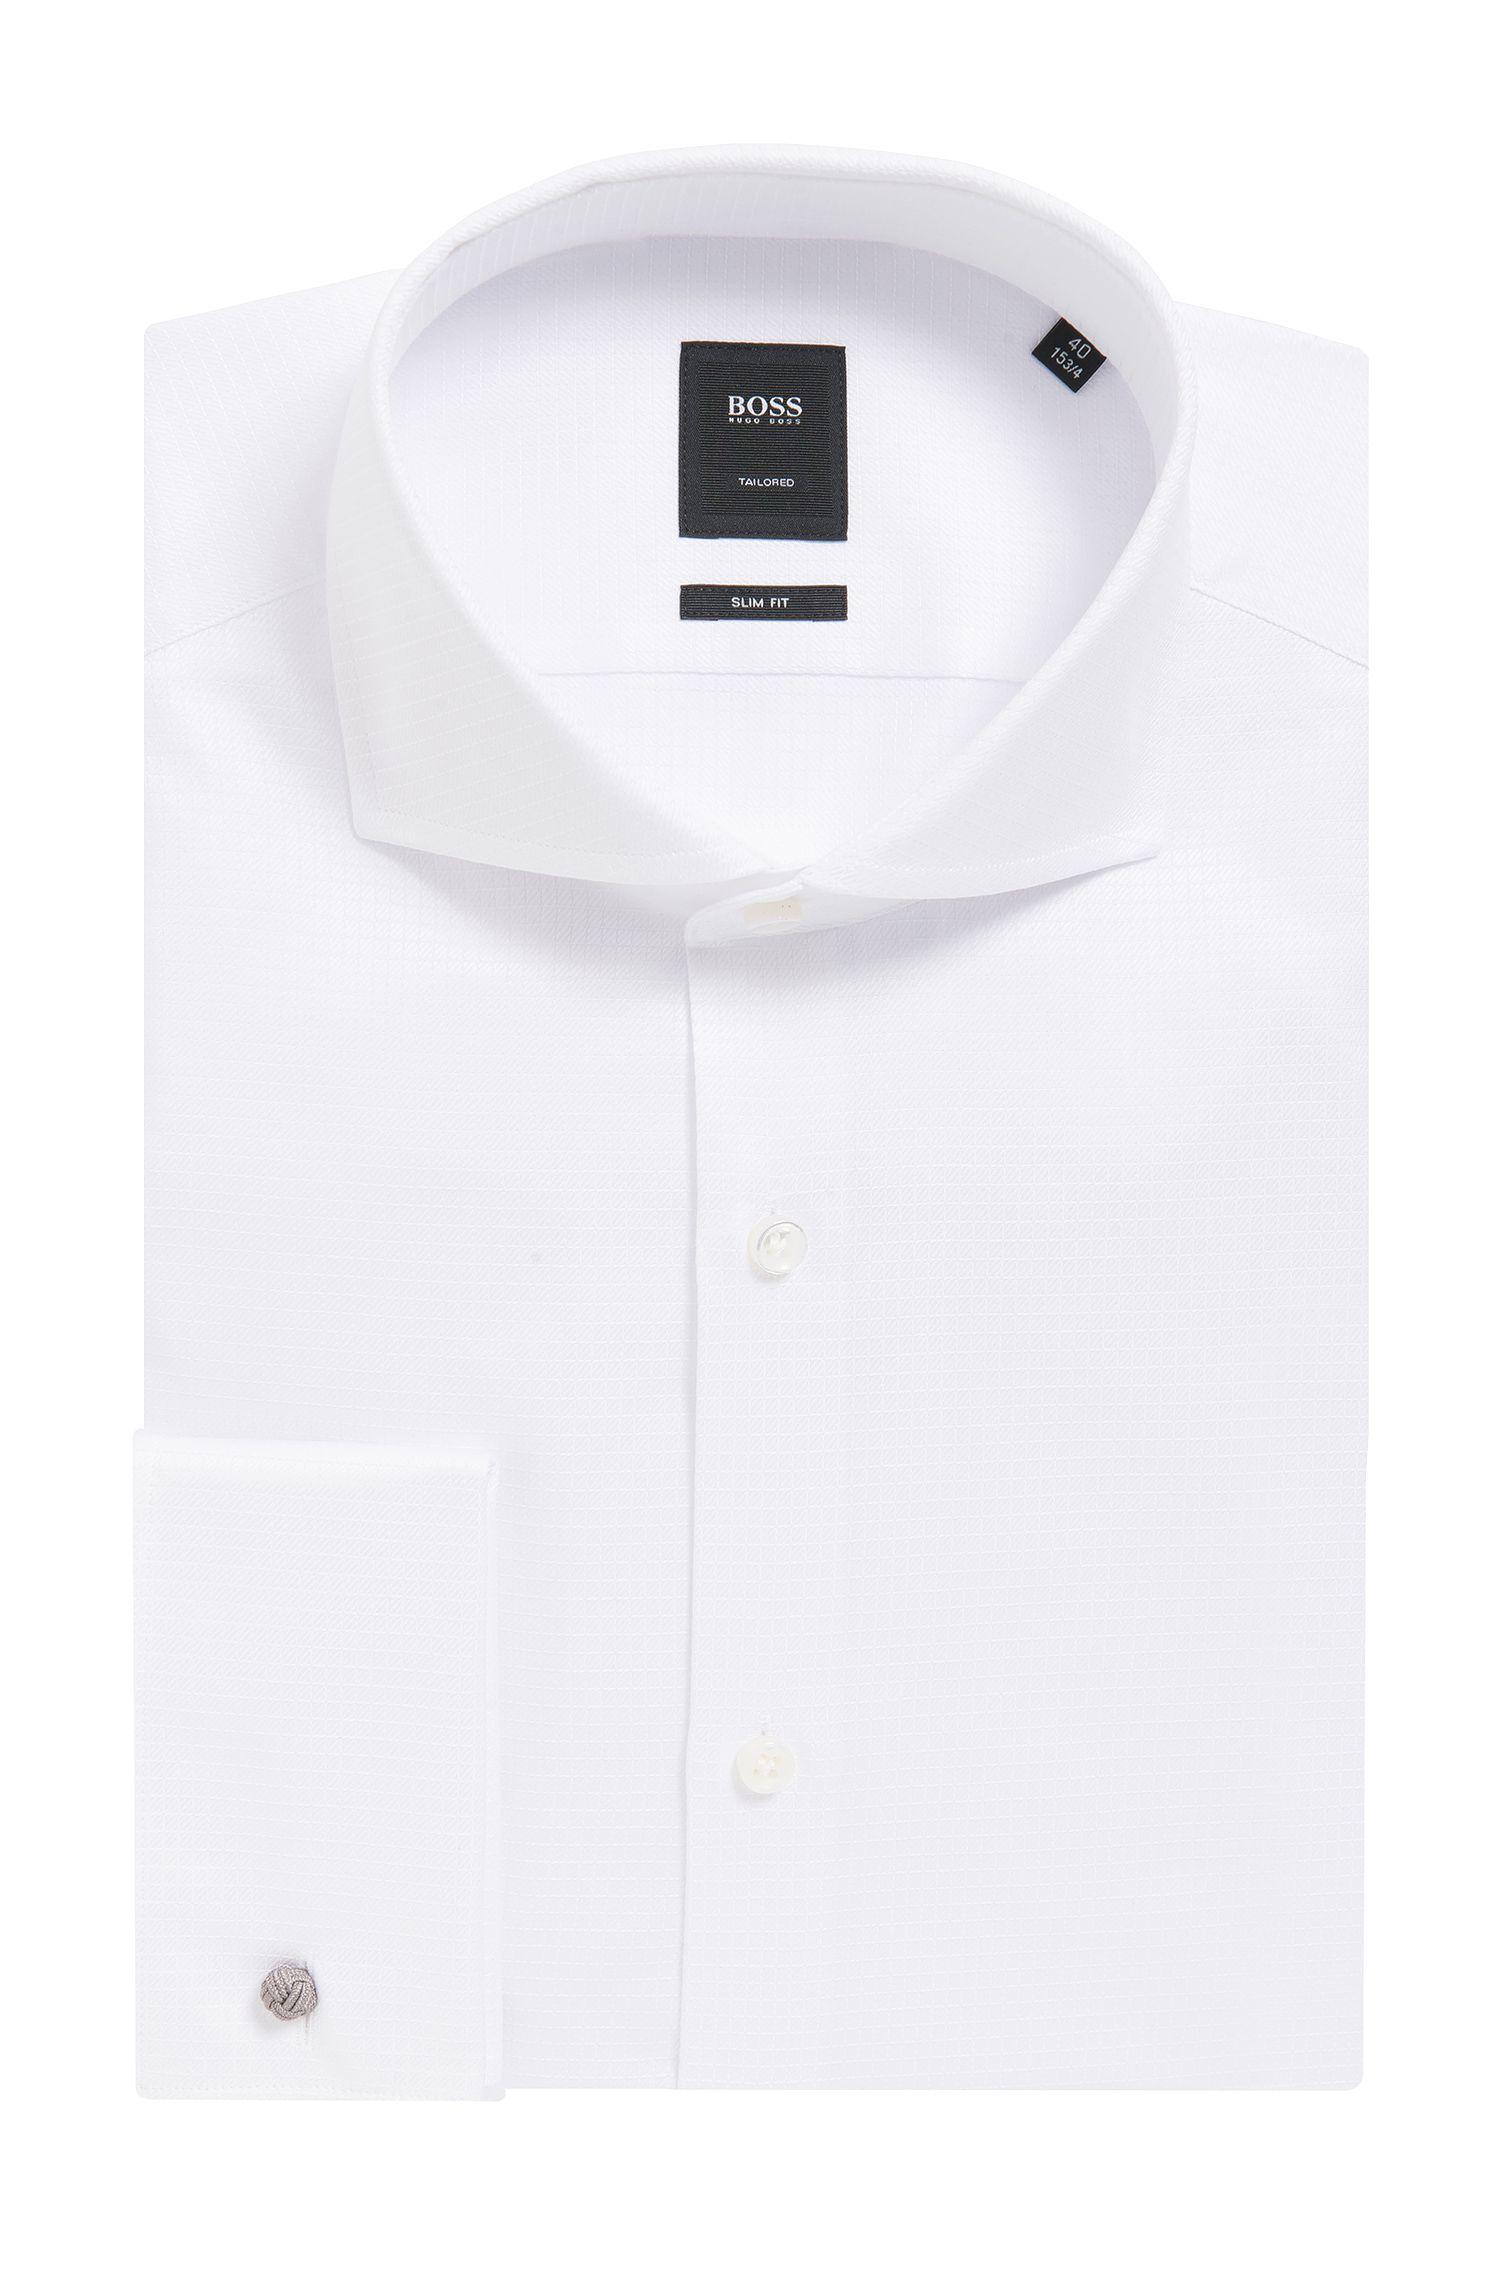 'T-Yacob'   Slim Fit, Tonal Check Cotton Dress Shirt